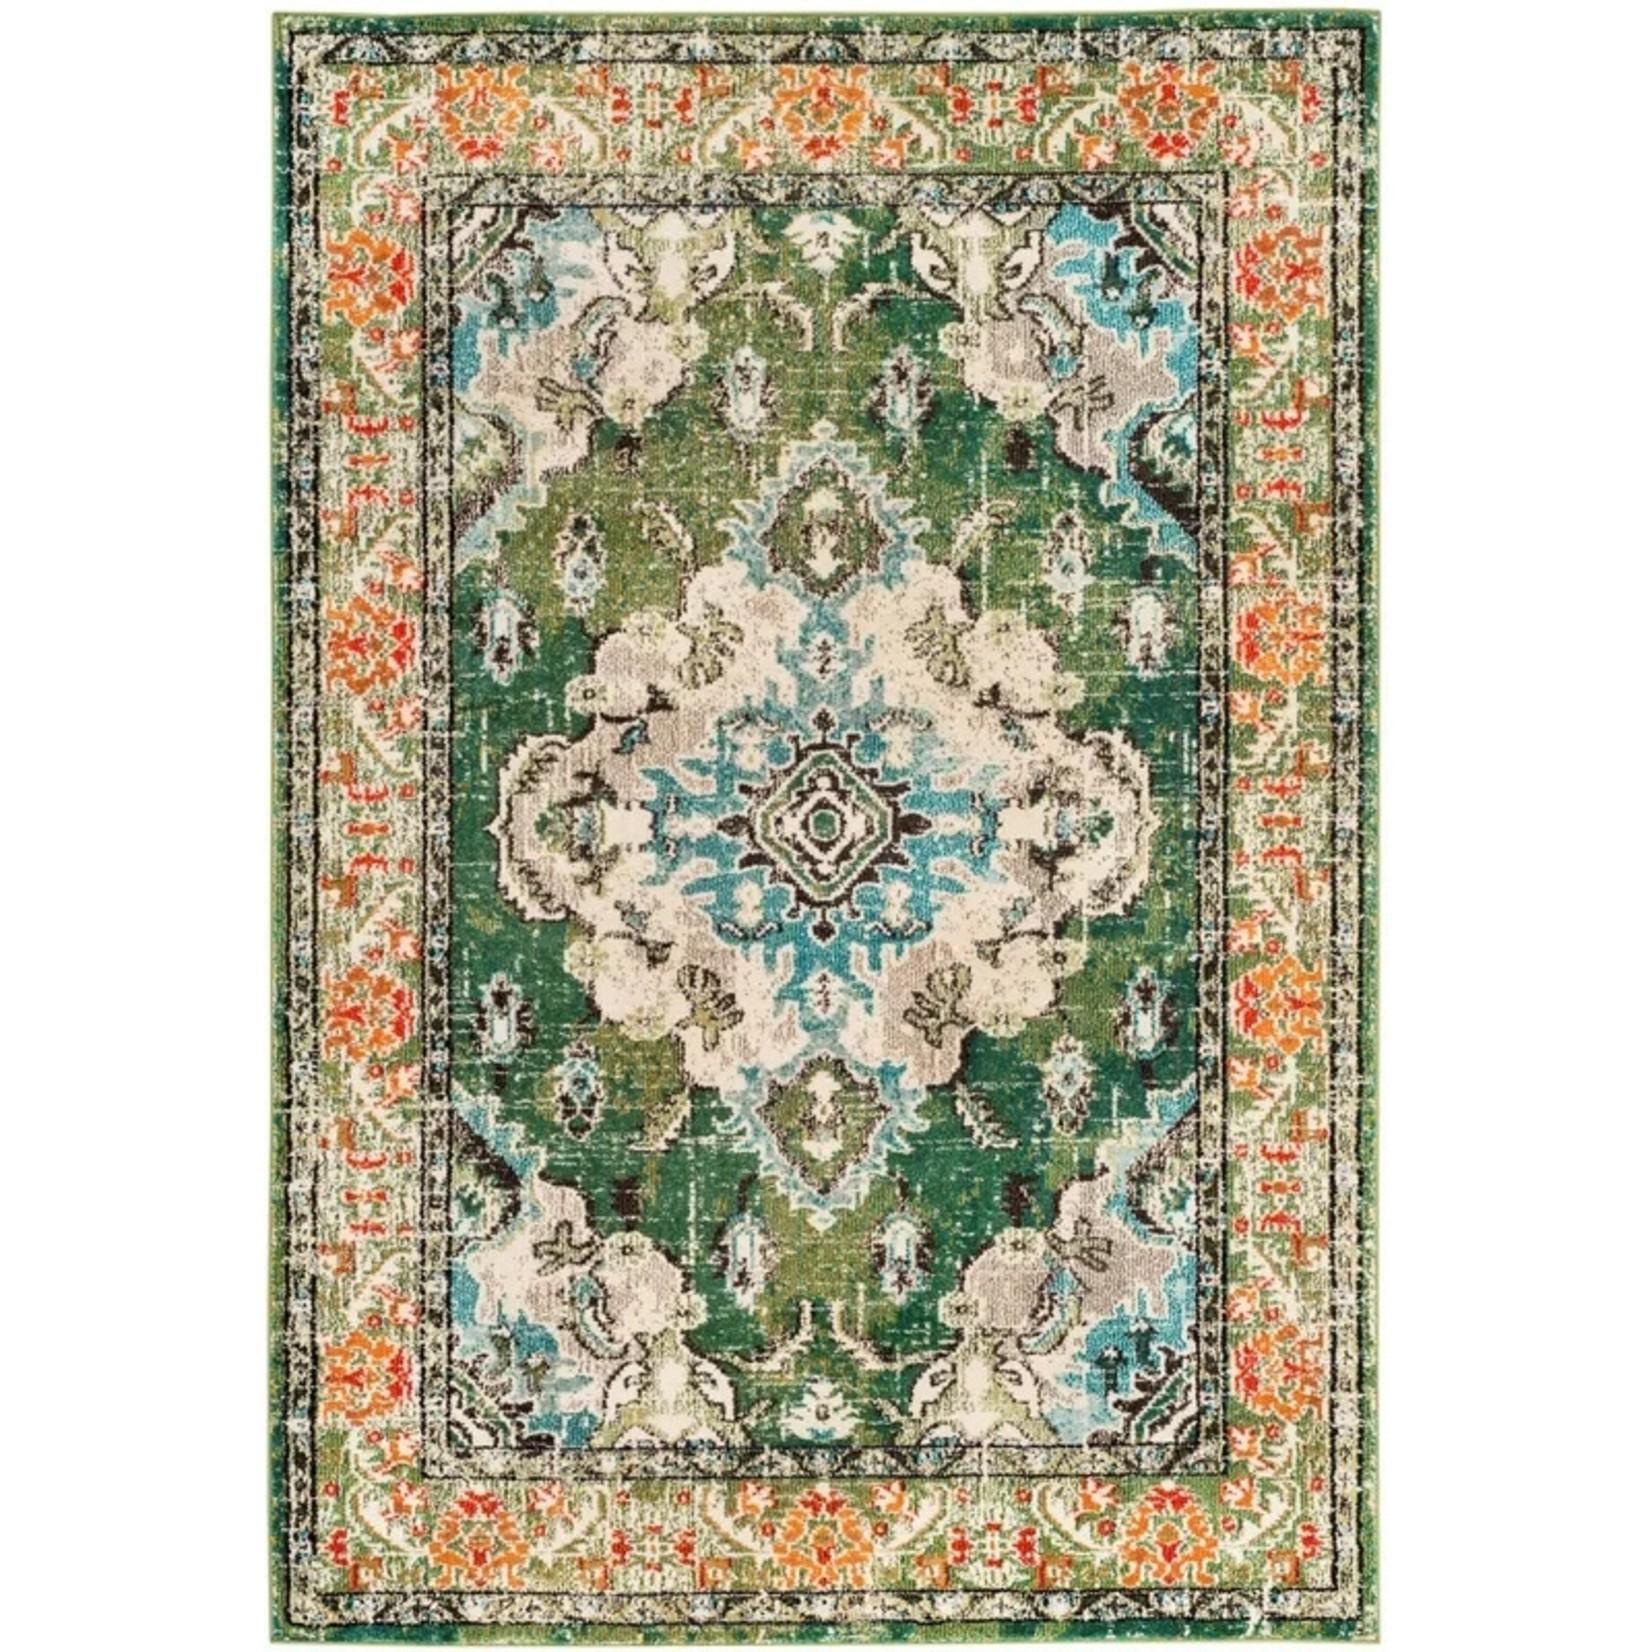 *8' x 10' - Indira Oriental Green/Light Blue Area Rug